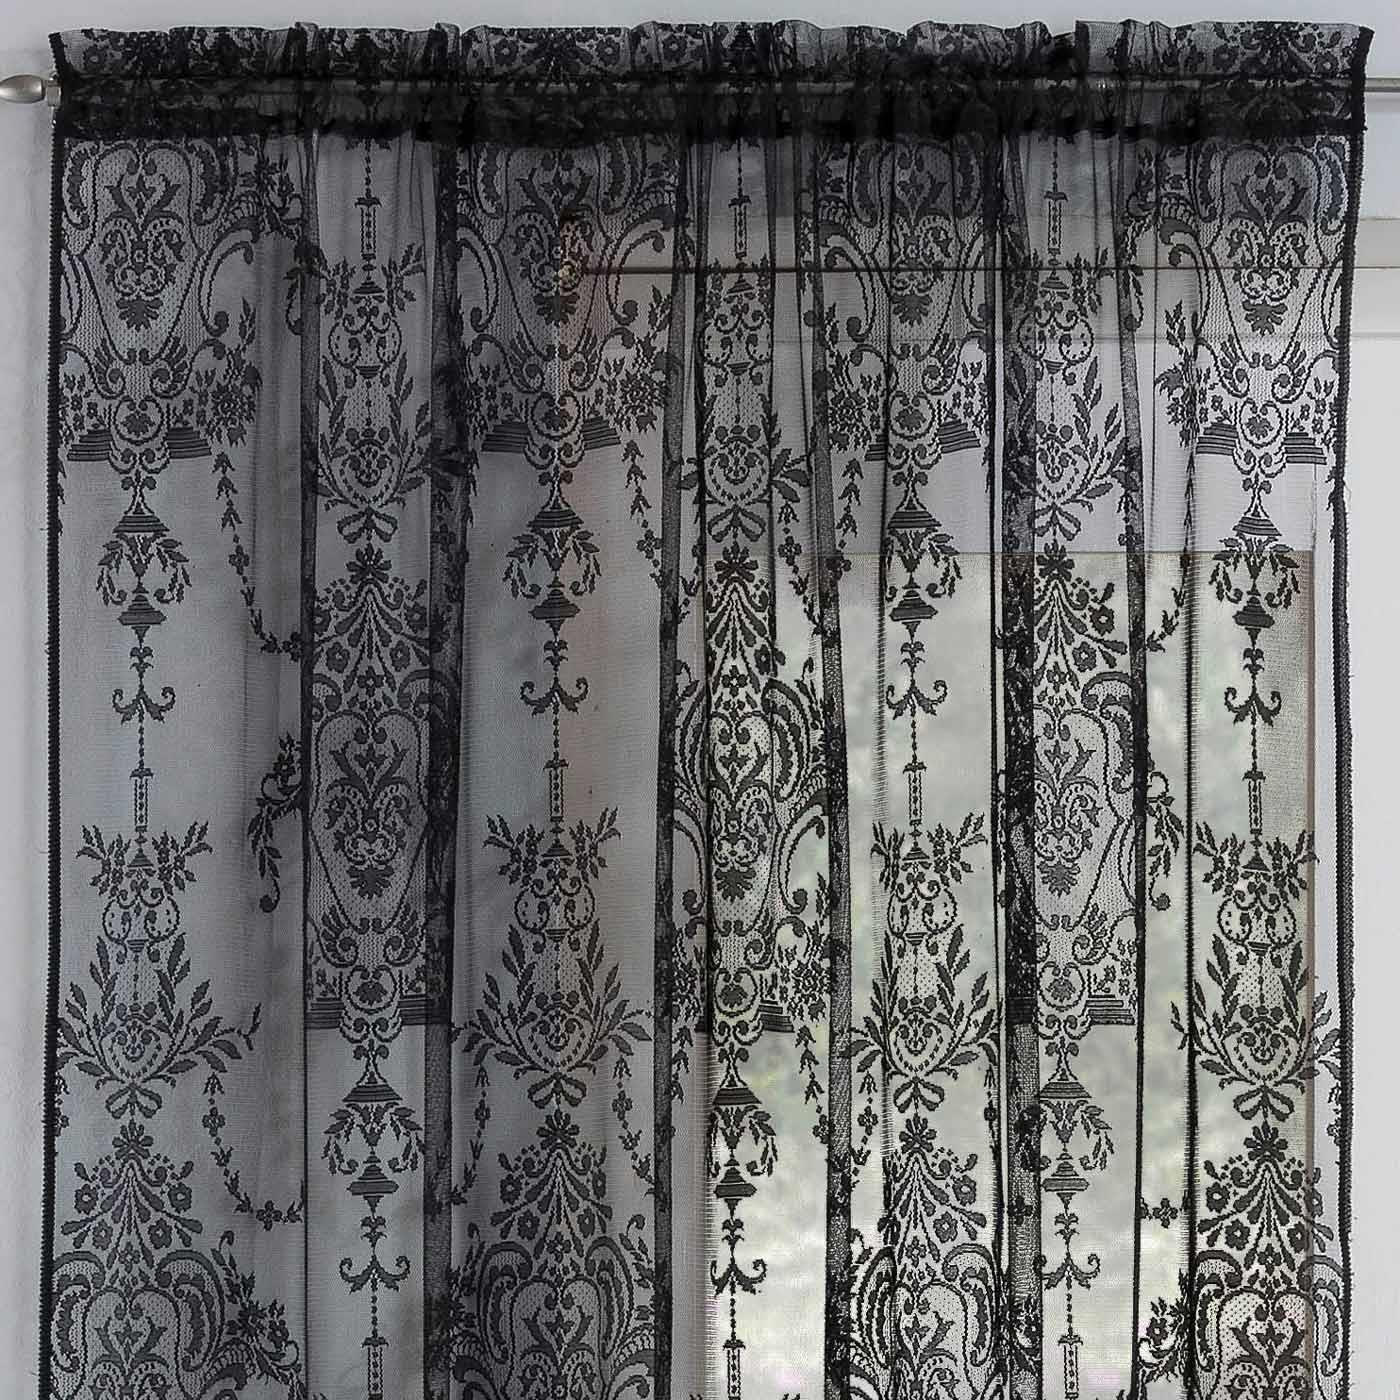 details about black voile curtain lace damask vintage slot panels rod pocket sheer voiles